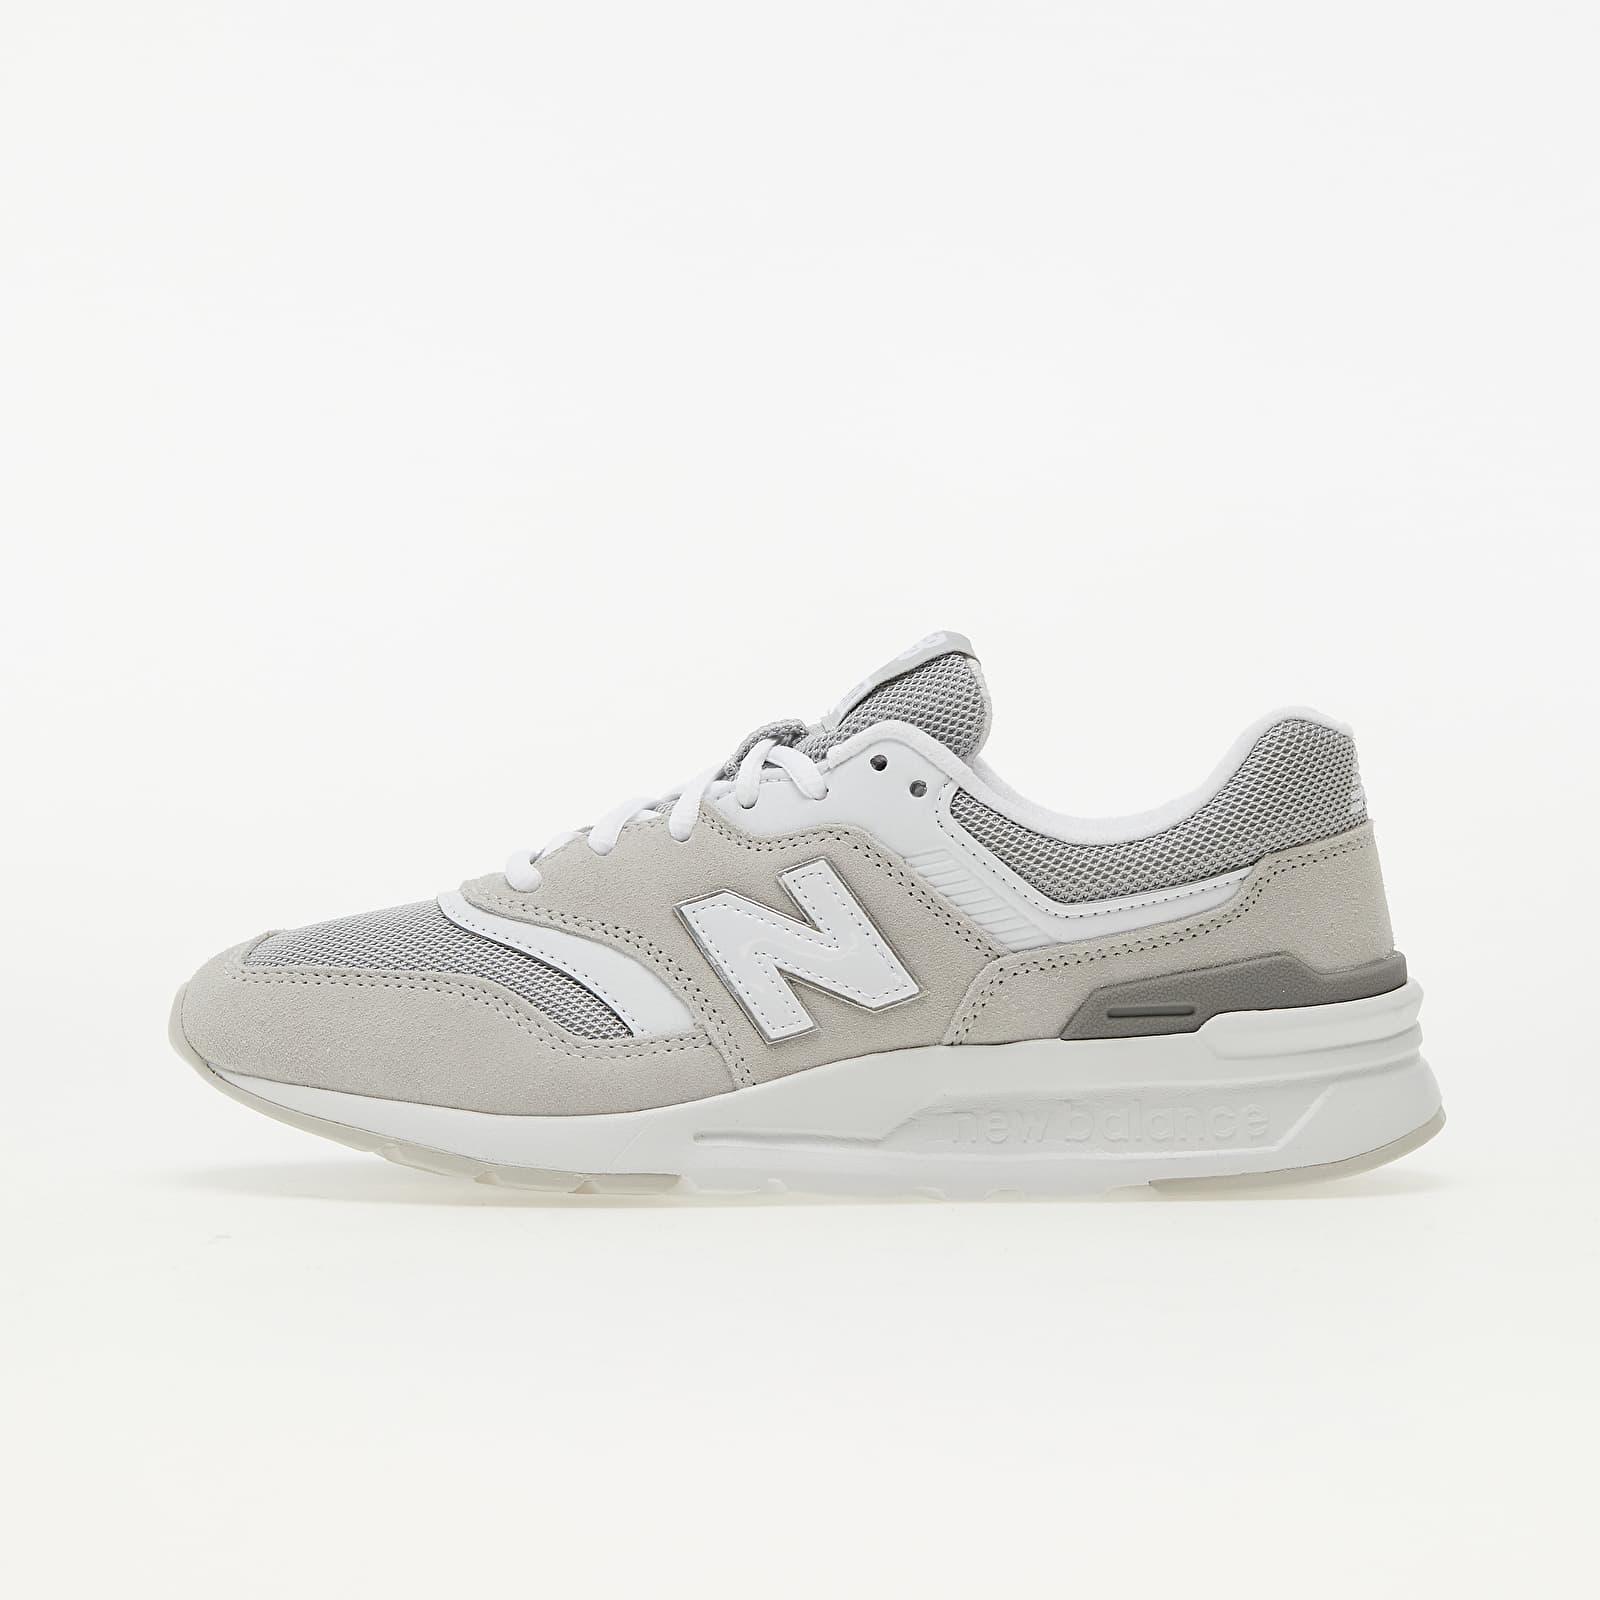 New Balance 997 Grey EUR 41.5